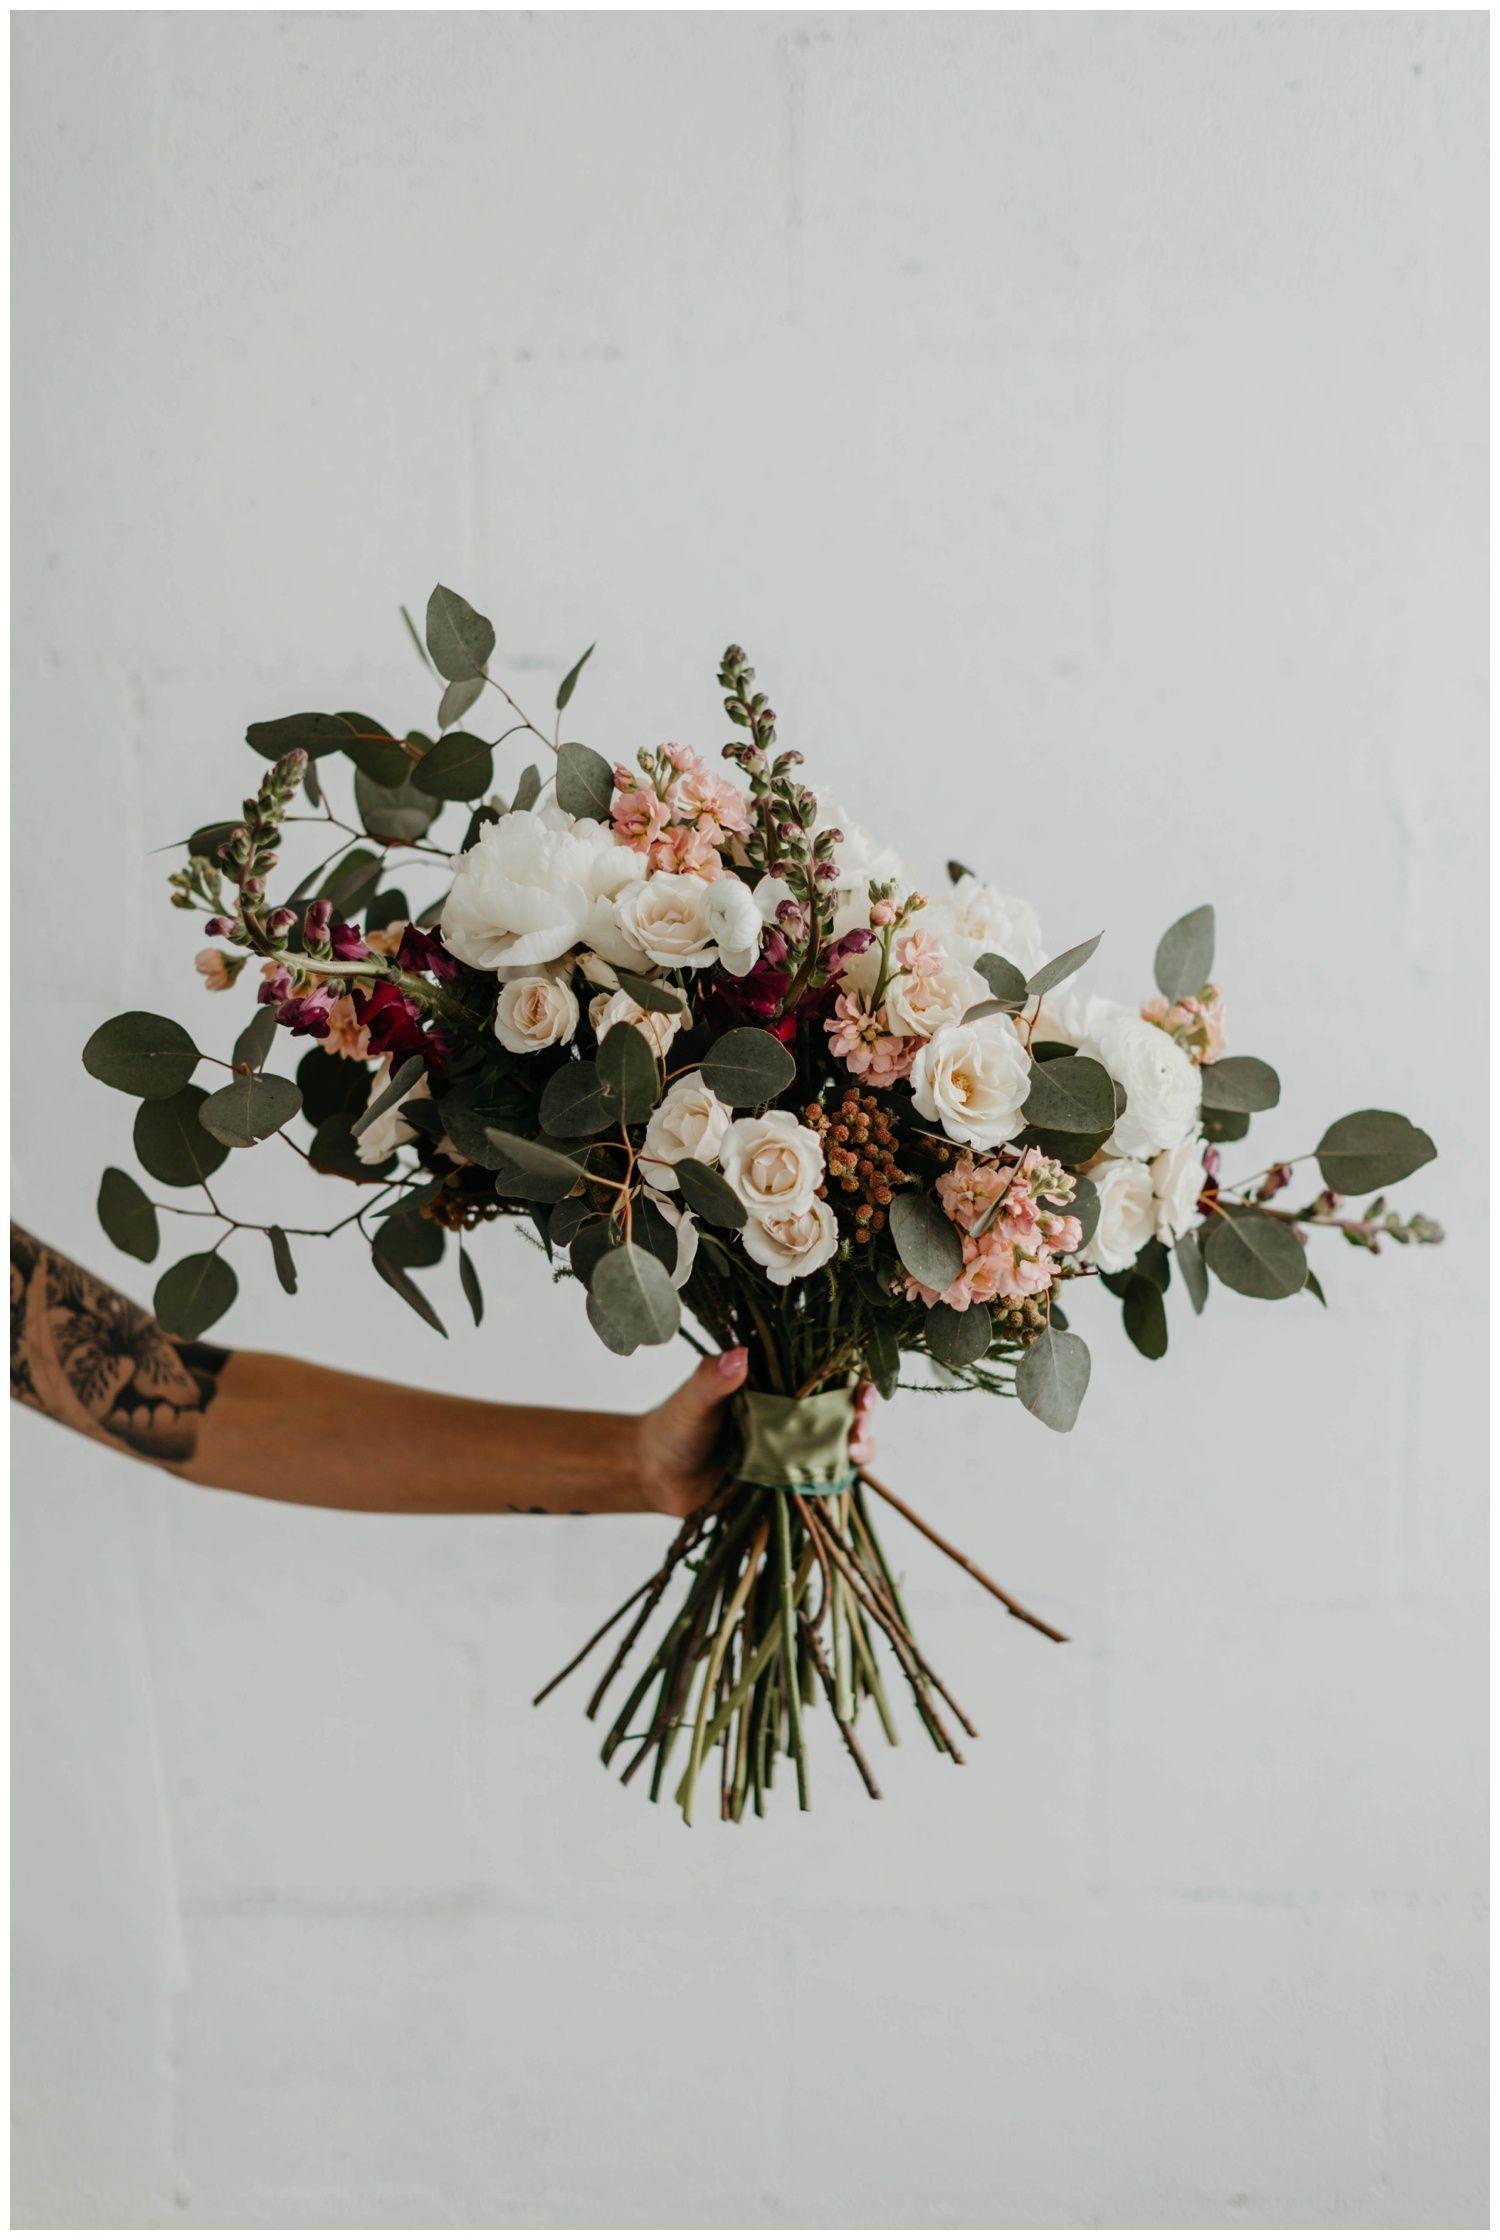 Floral + Bridal Accessory Inspo for the Modern Bride | Truvelle Bridal x Emma Katzka|a&bé bridal shop